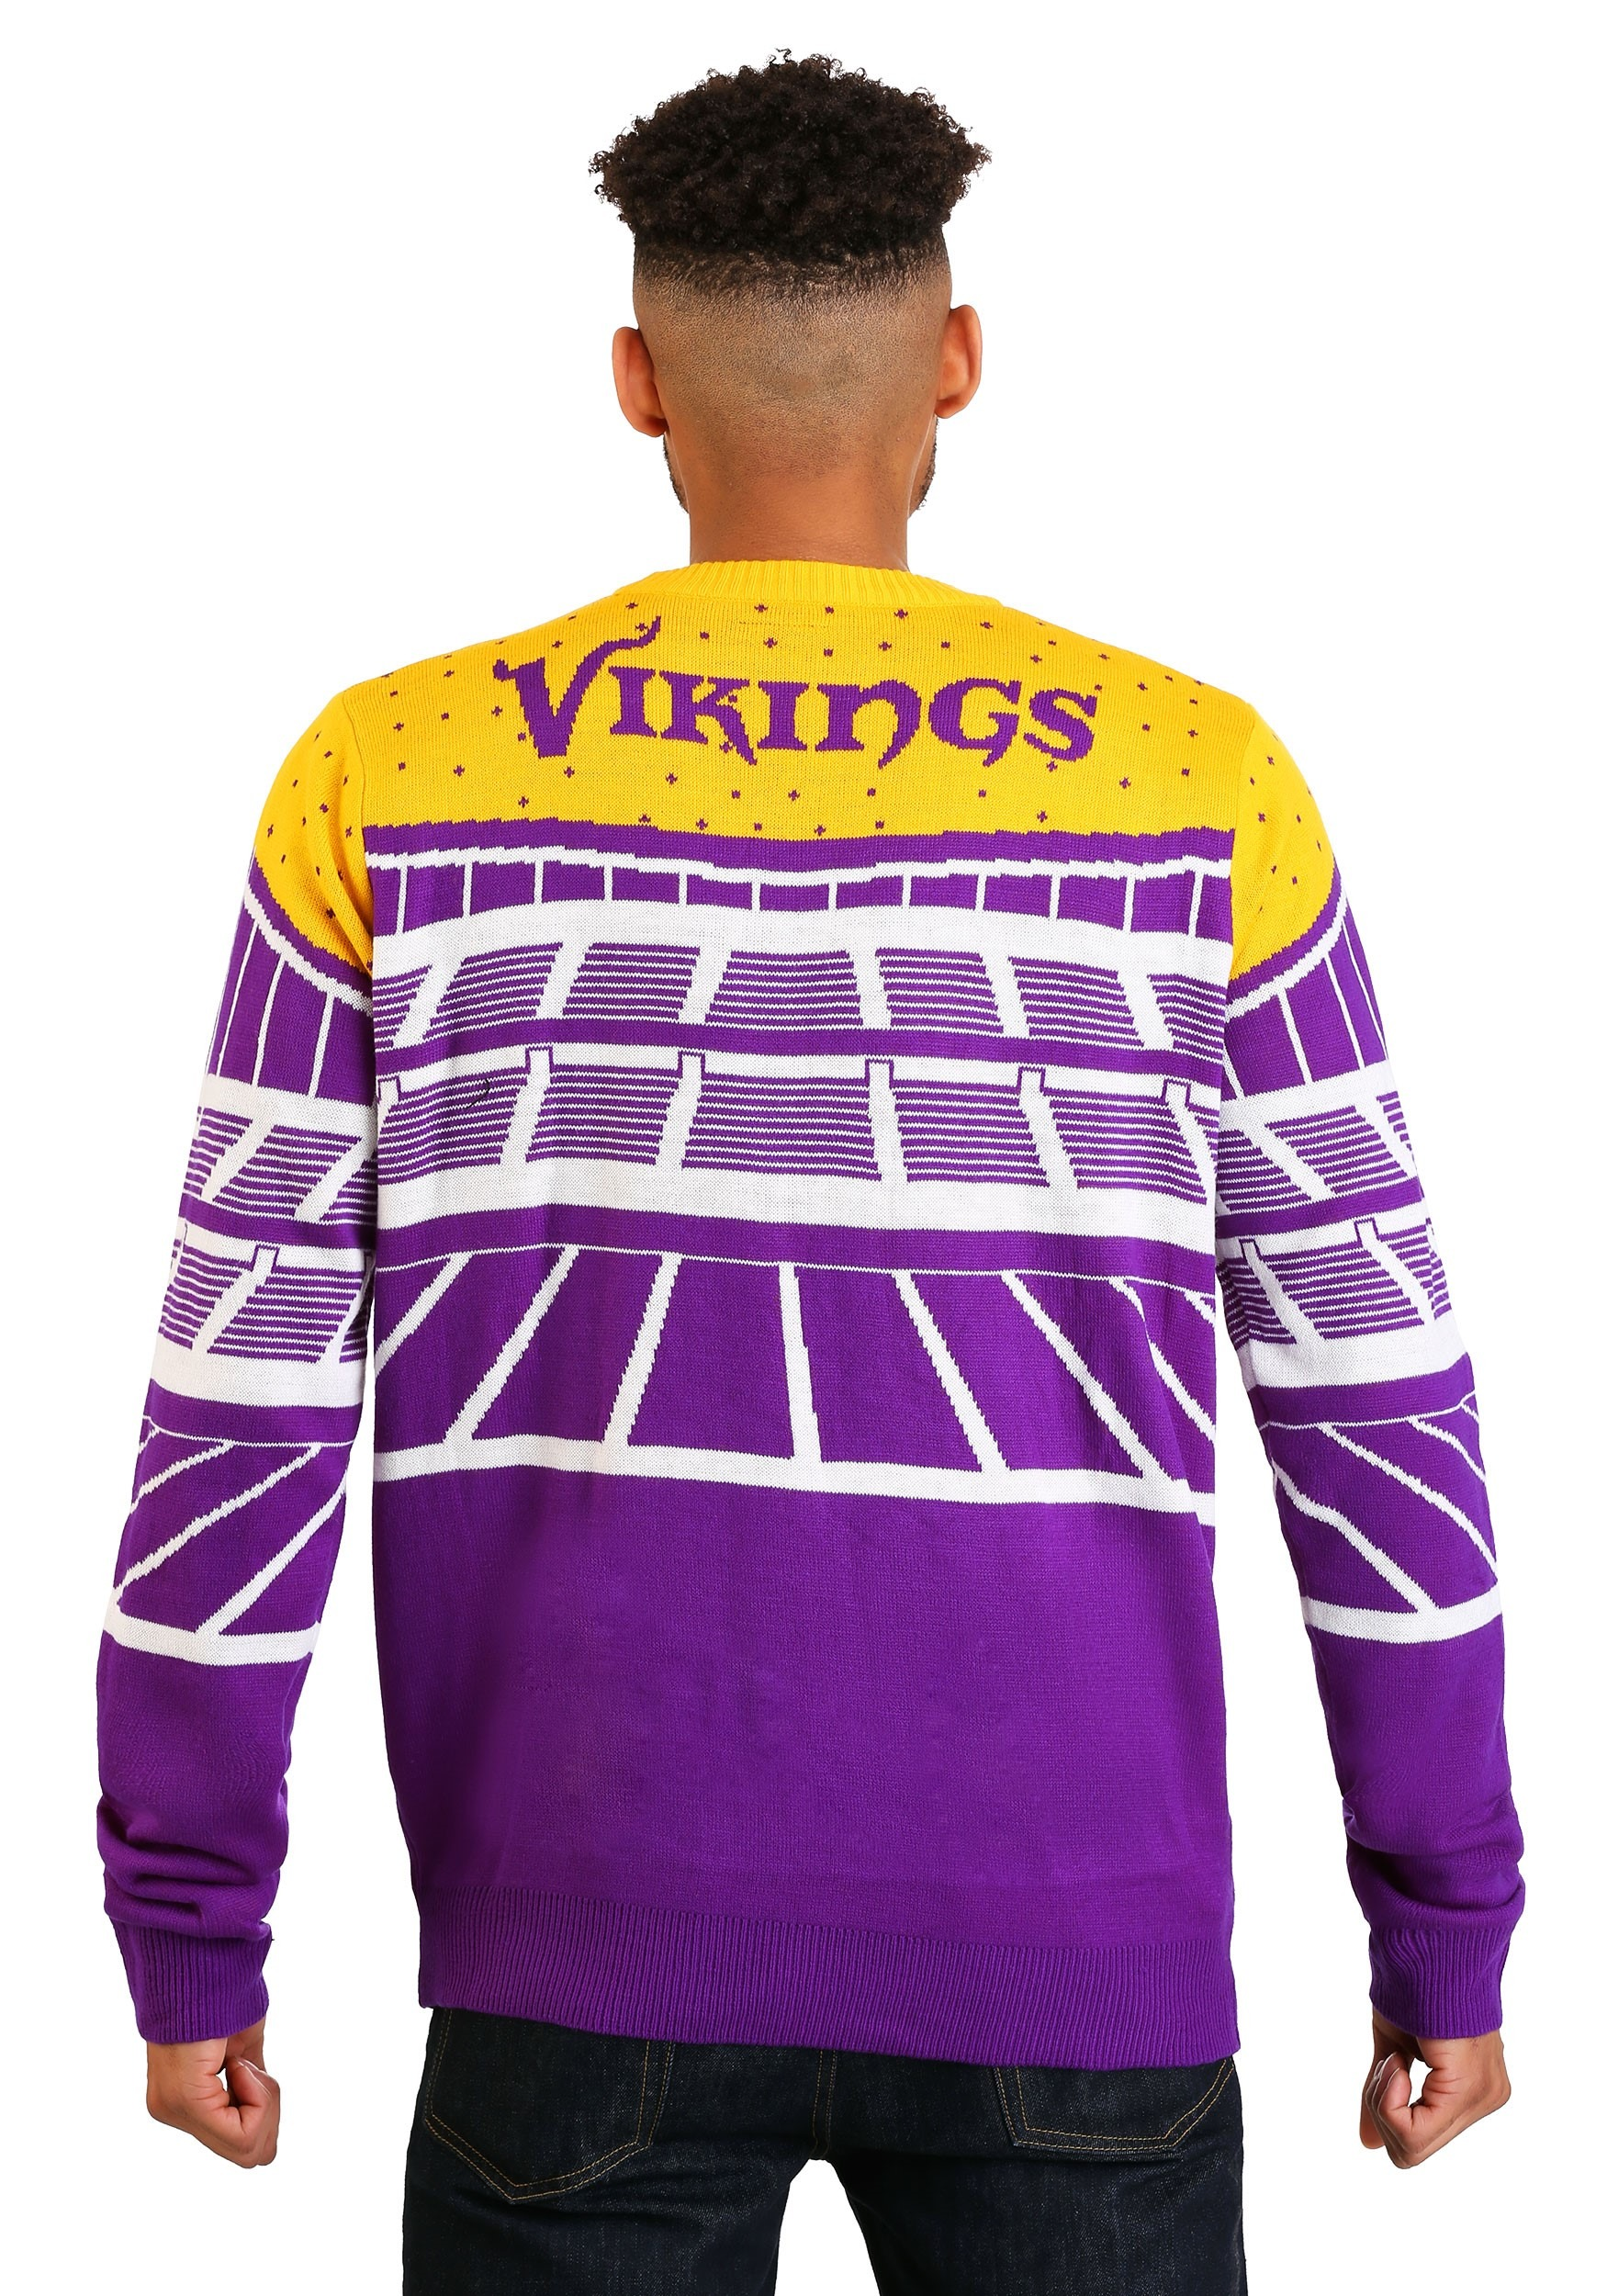 c2c68bb9f09 Minnesota Vikings Light Up Bluetooth Ugly Christmas Sweater